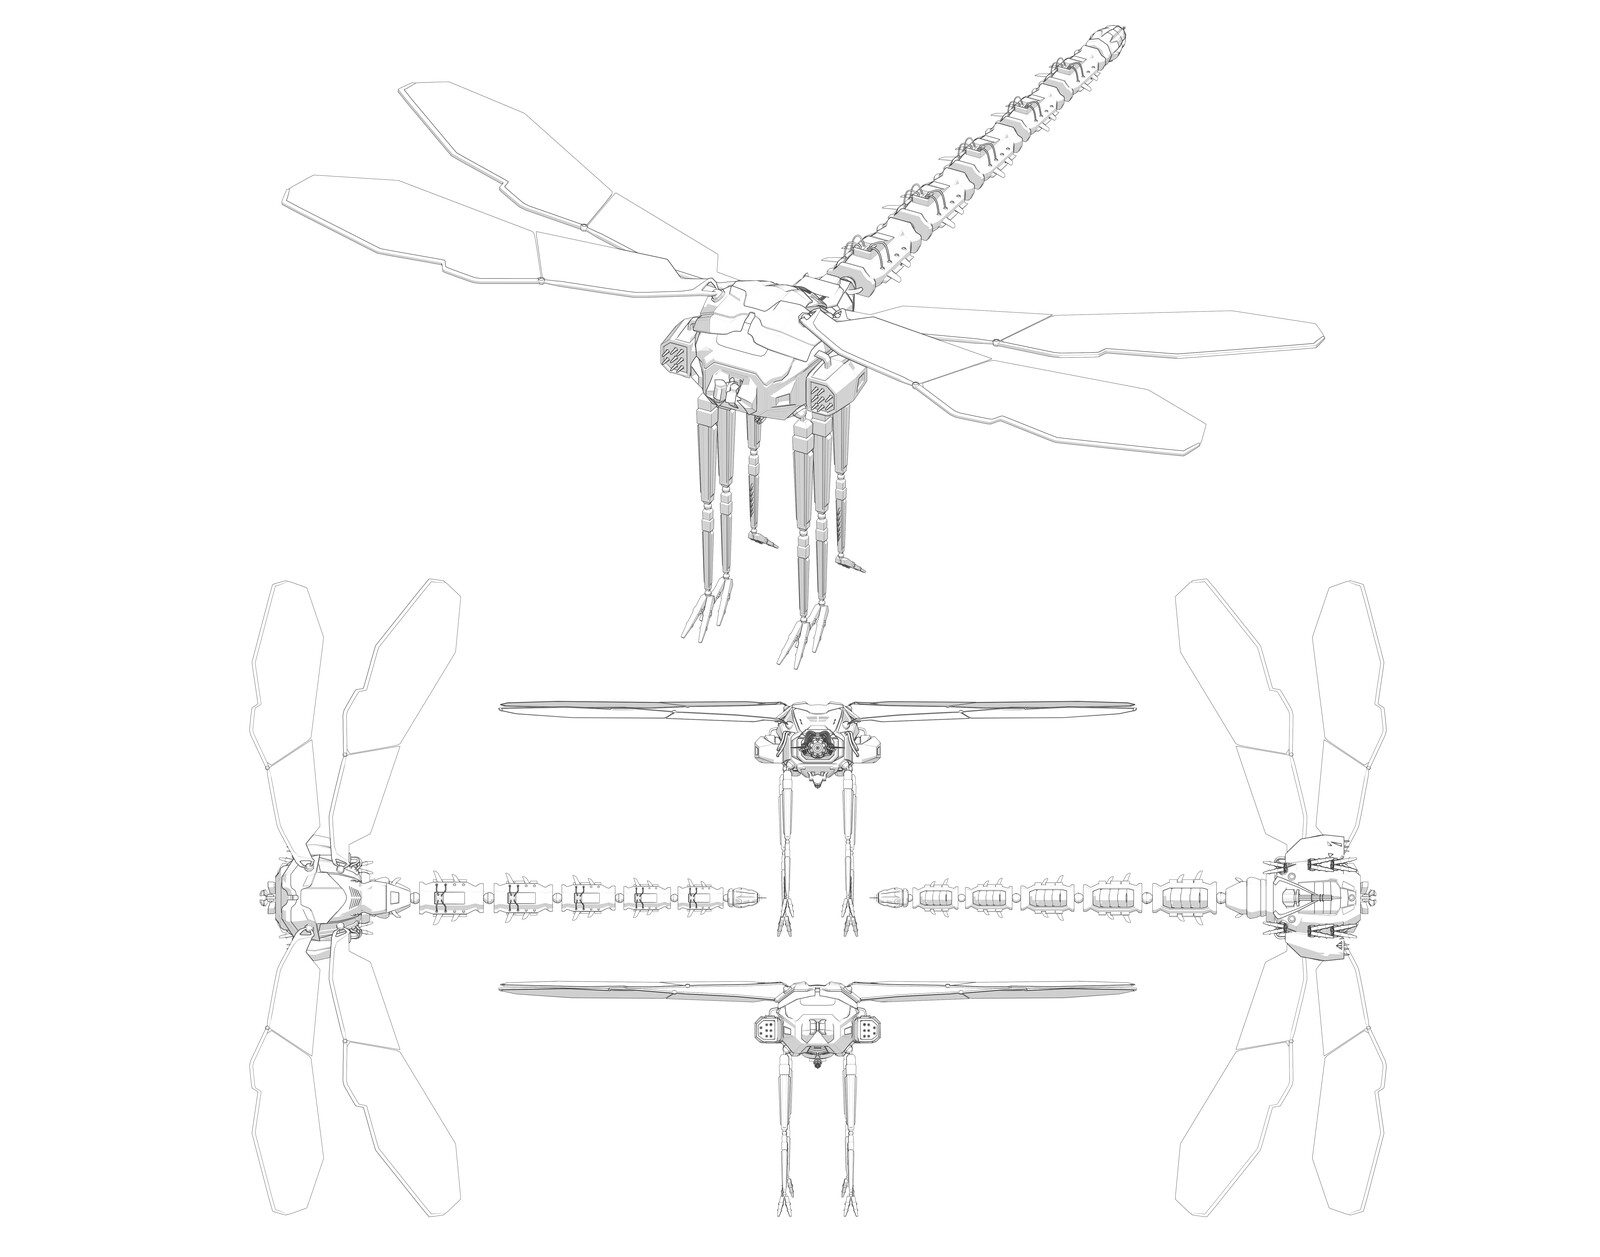 Dragonfly Mech